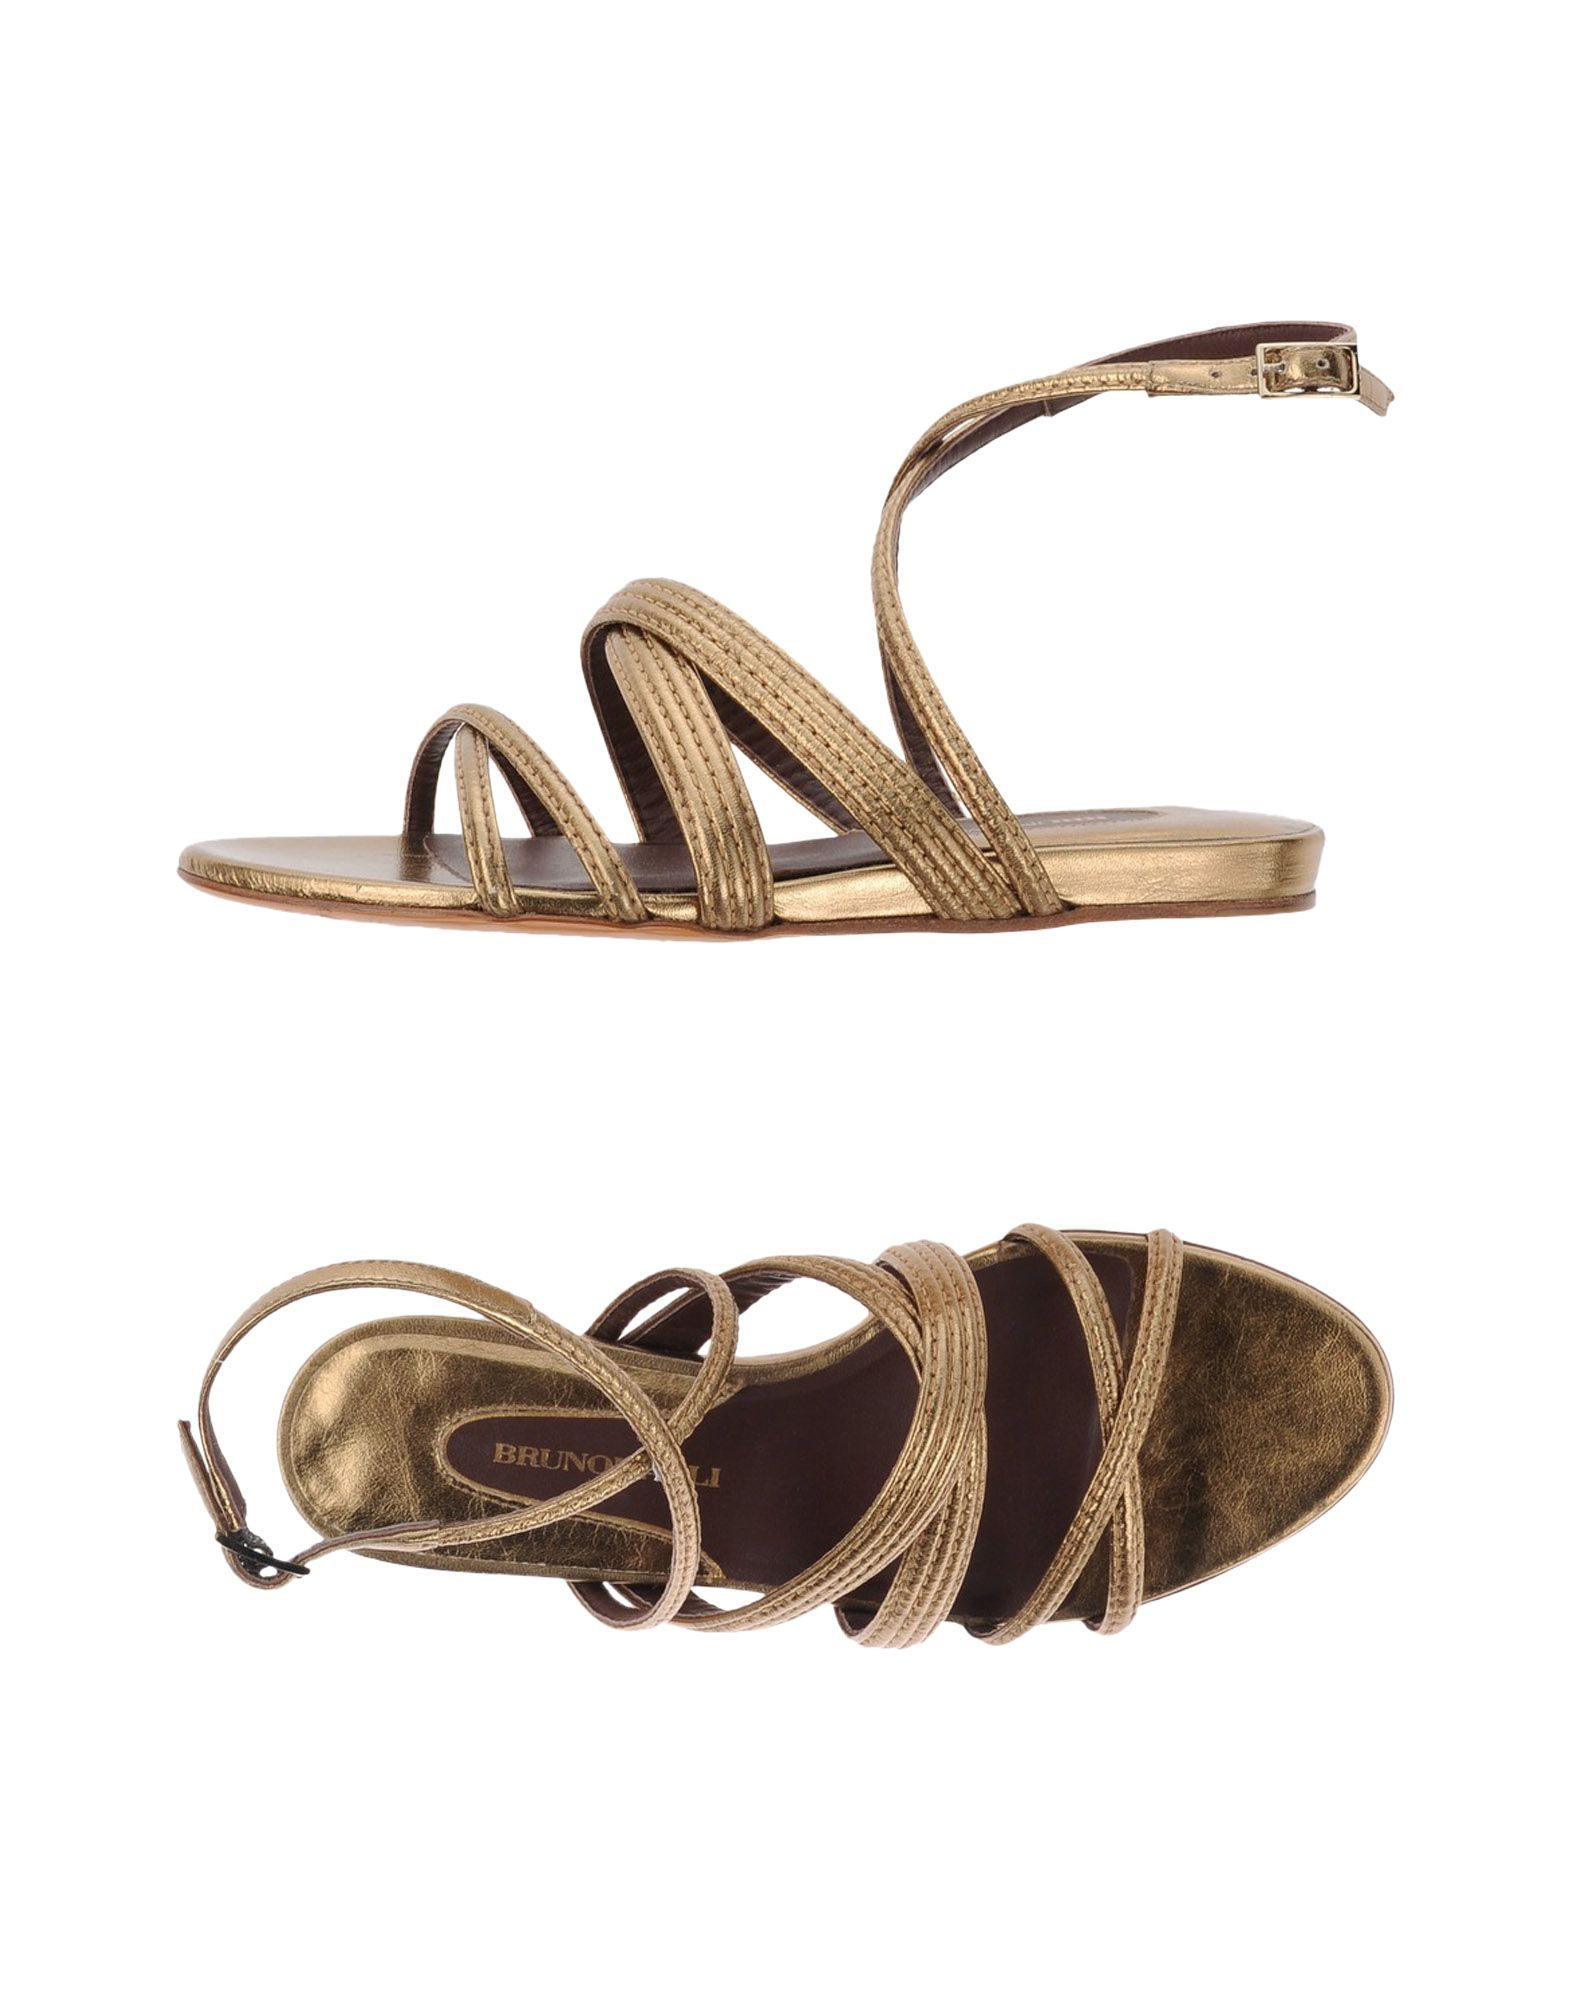 Bruno Magli Platinum Leather Sandals